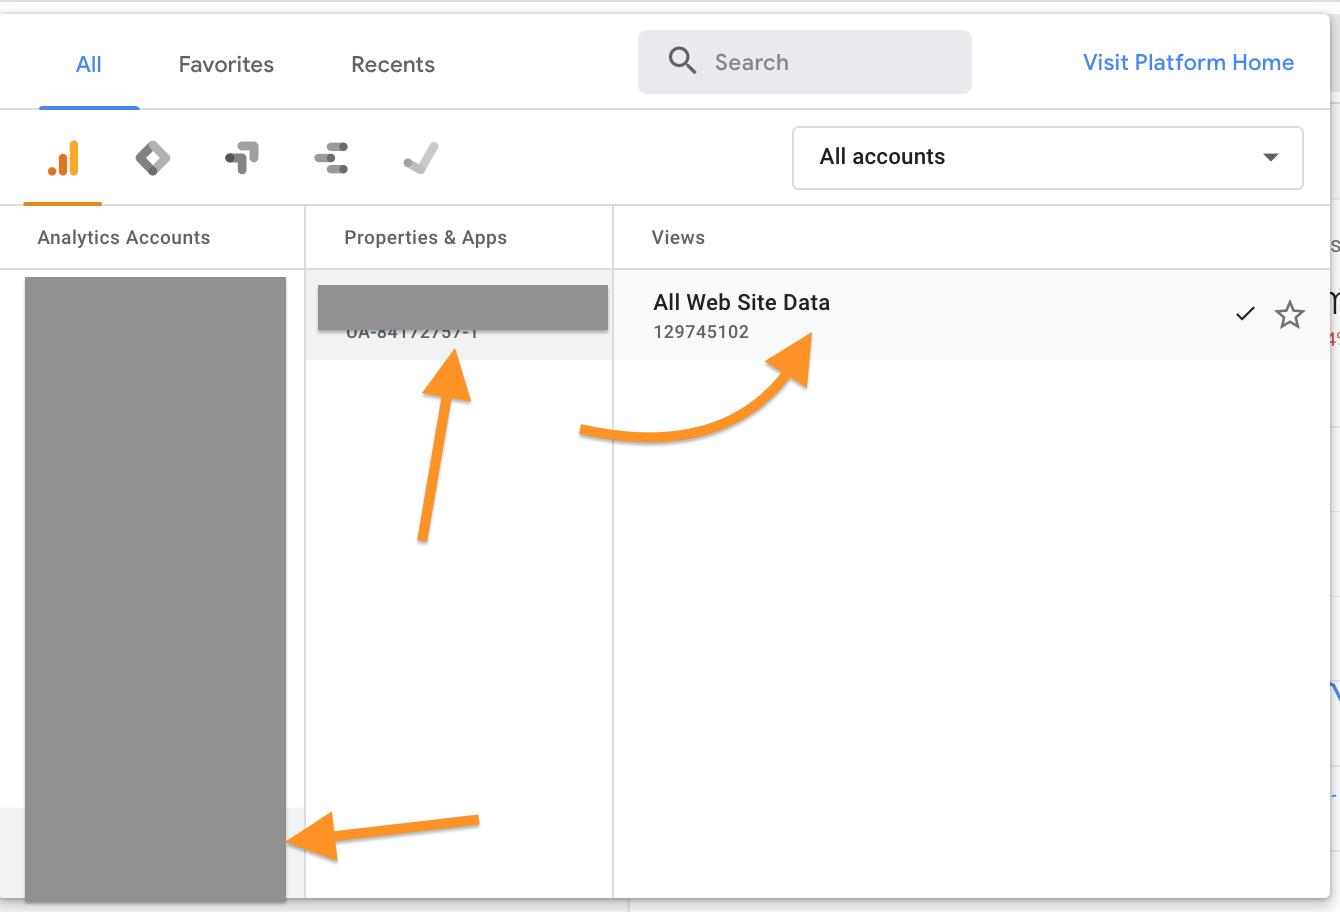 account < property > view google analytics screen capture